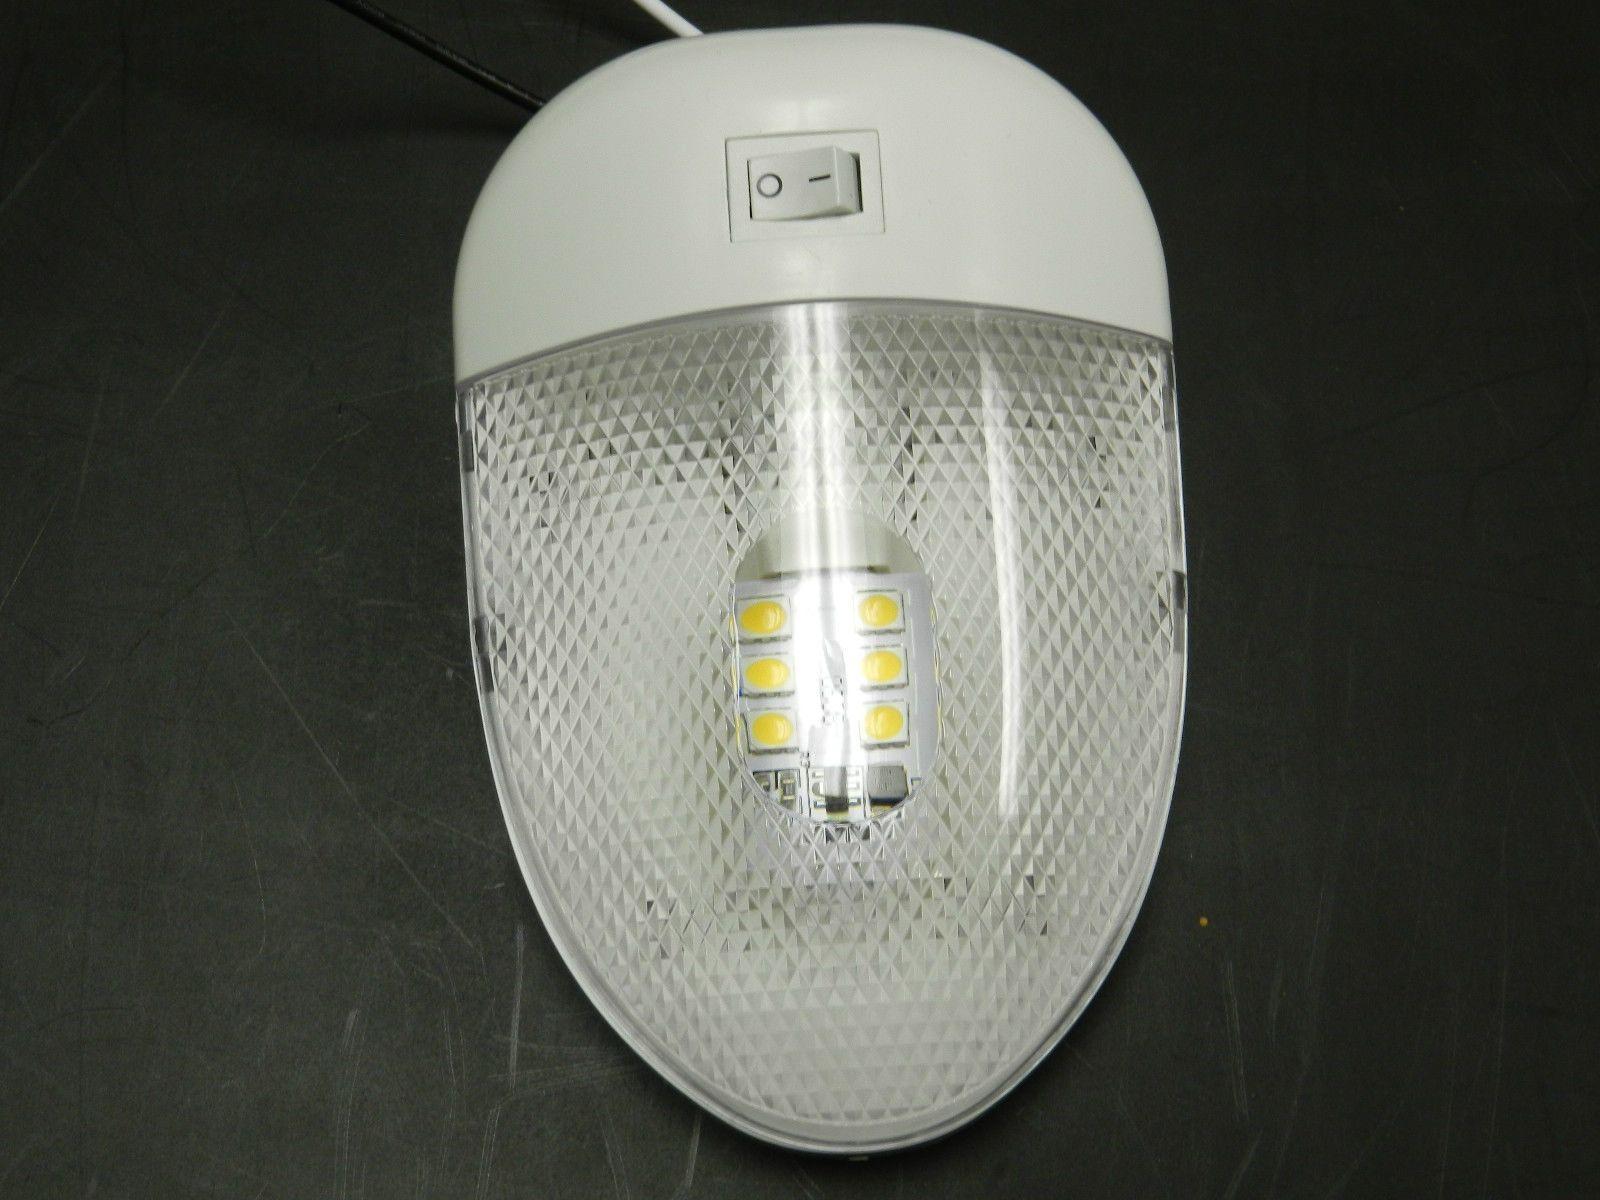 12 volt led lighting fixtures httpscartclub pinterest 12 volt led lighting fixtures mozeypictures Choice Image